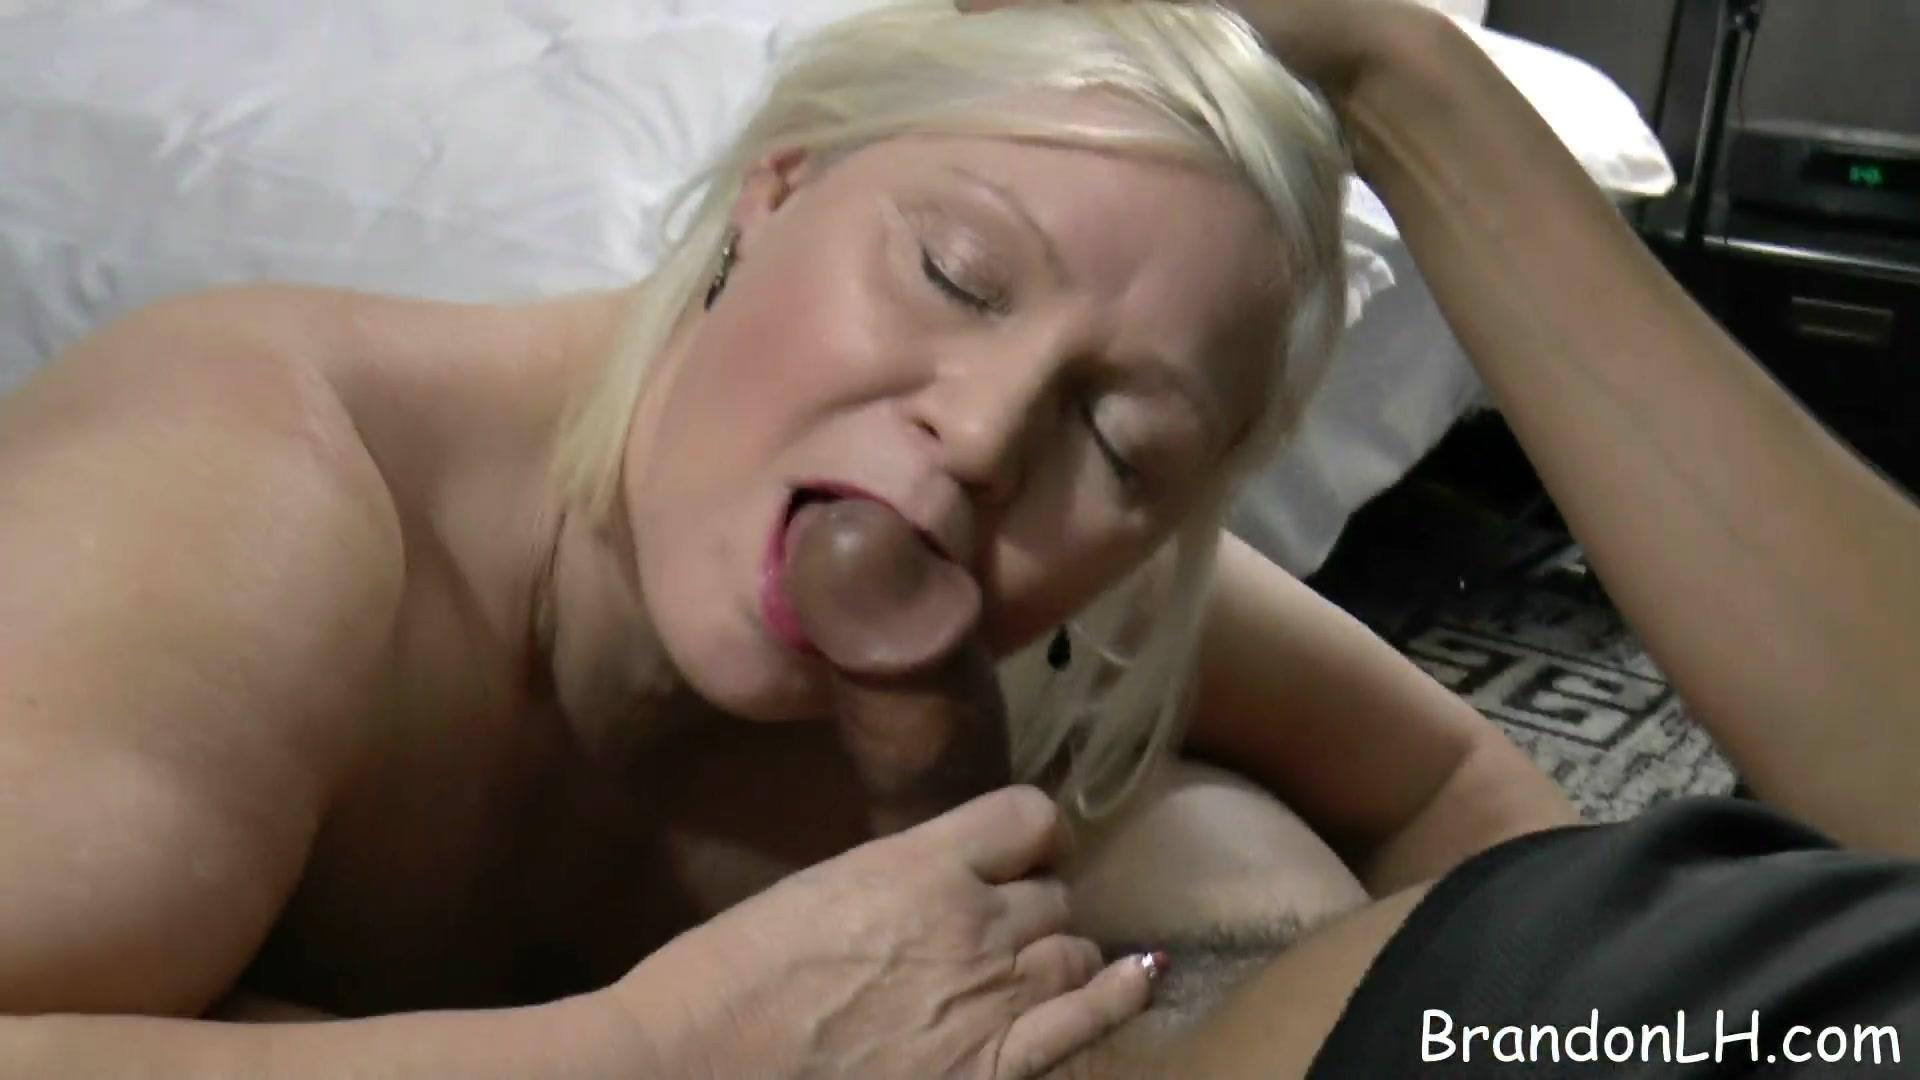 White chicks blowjob black dicks, guys nacked mastrobateing